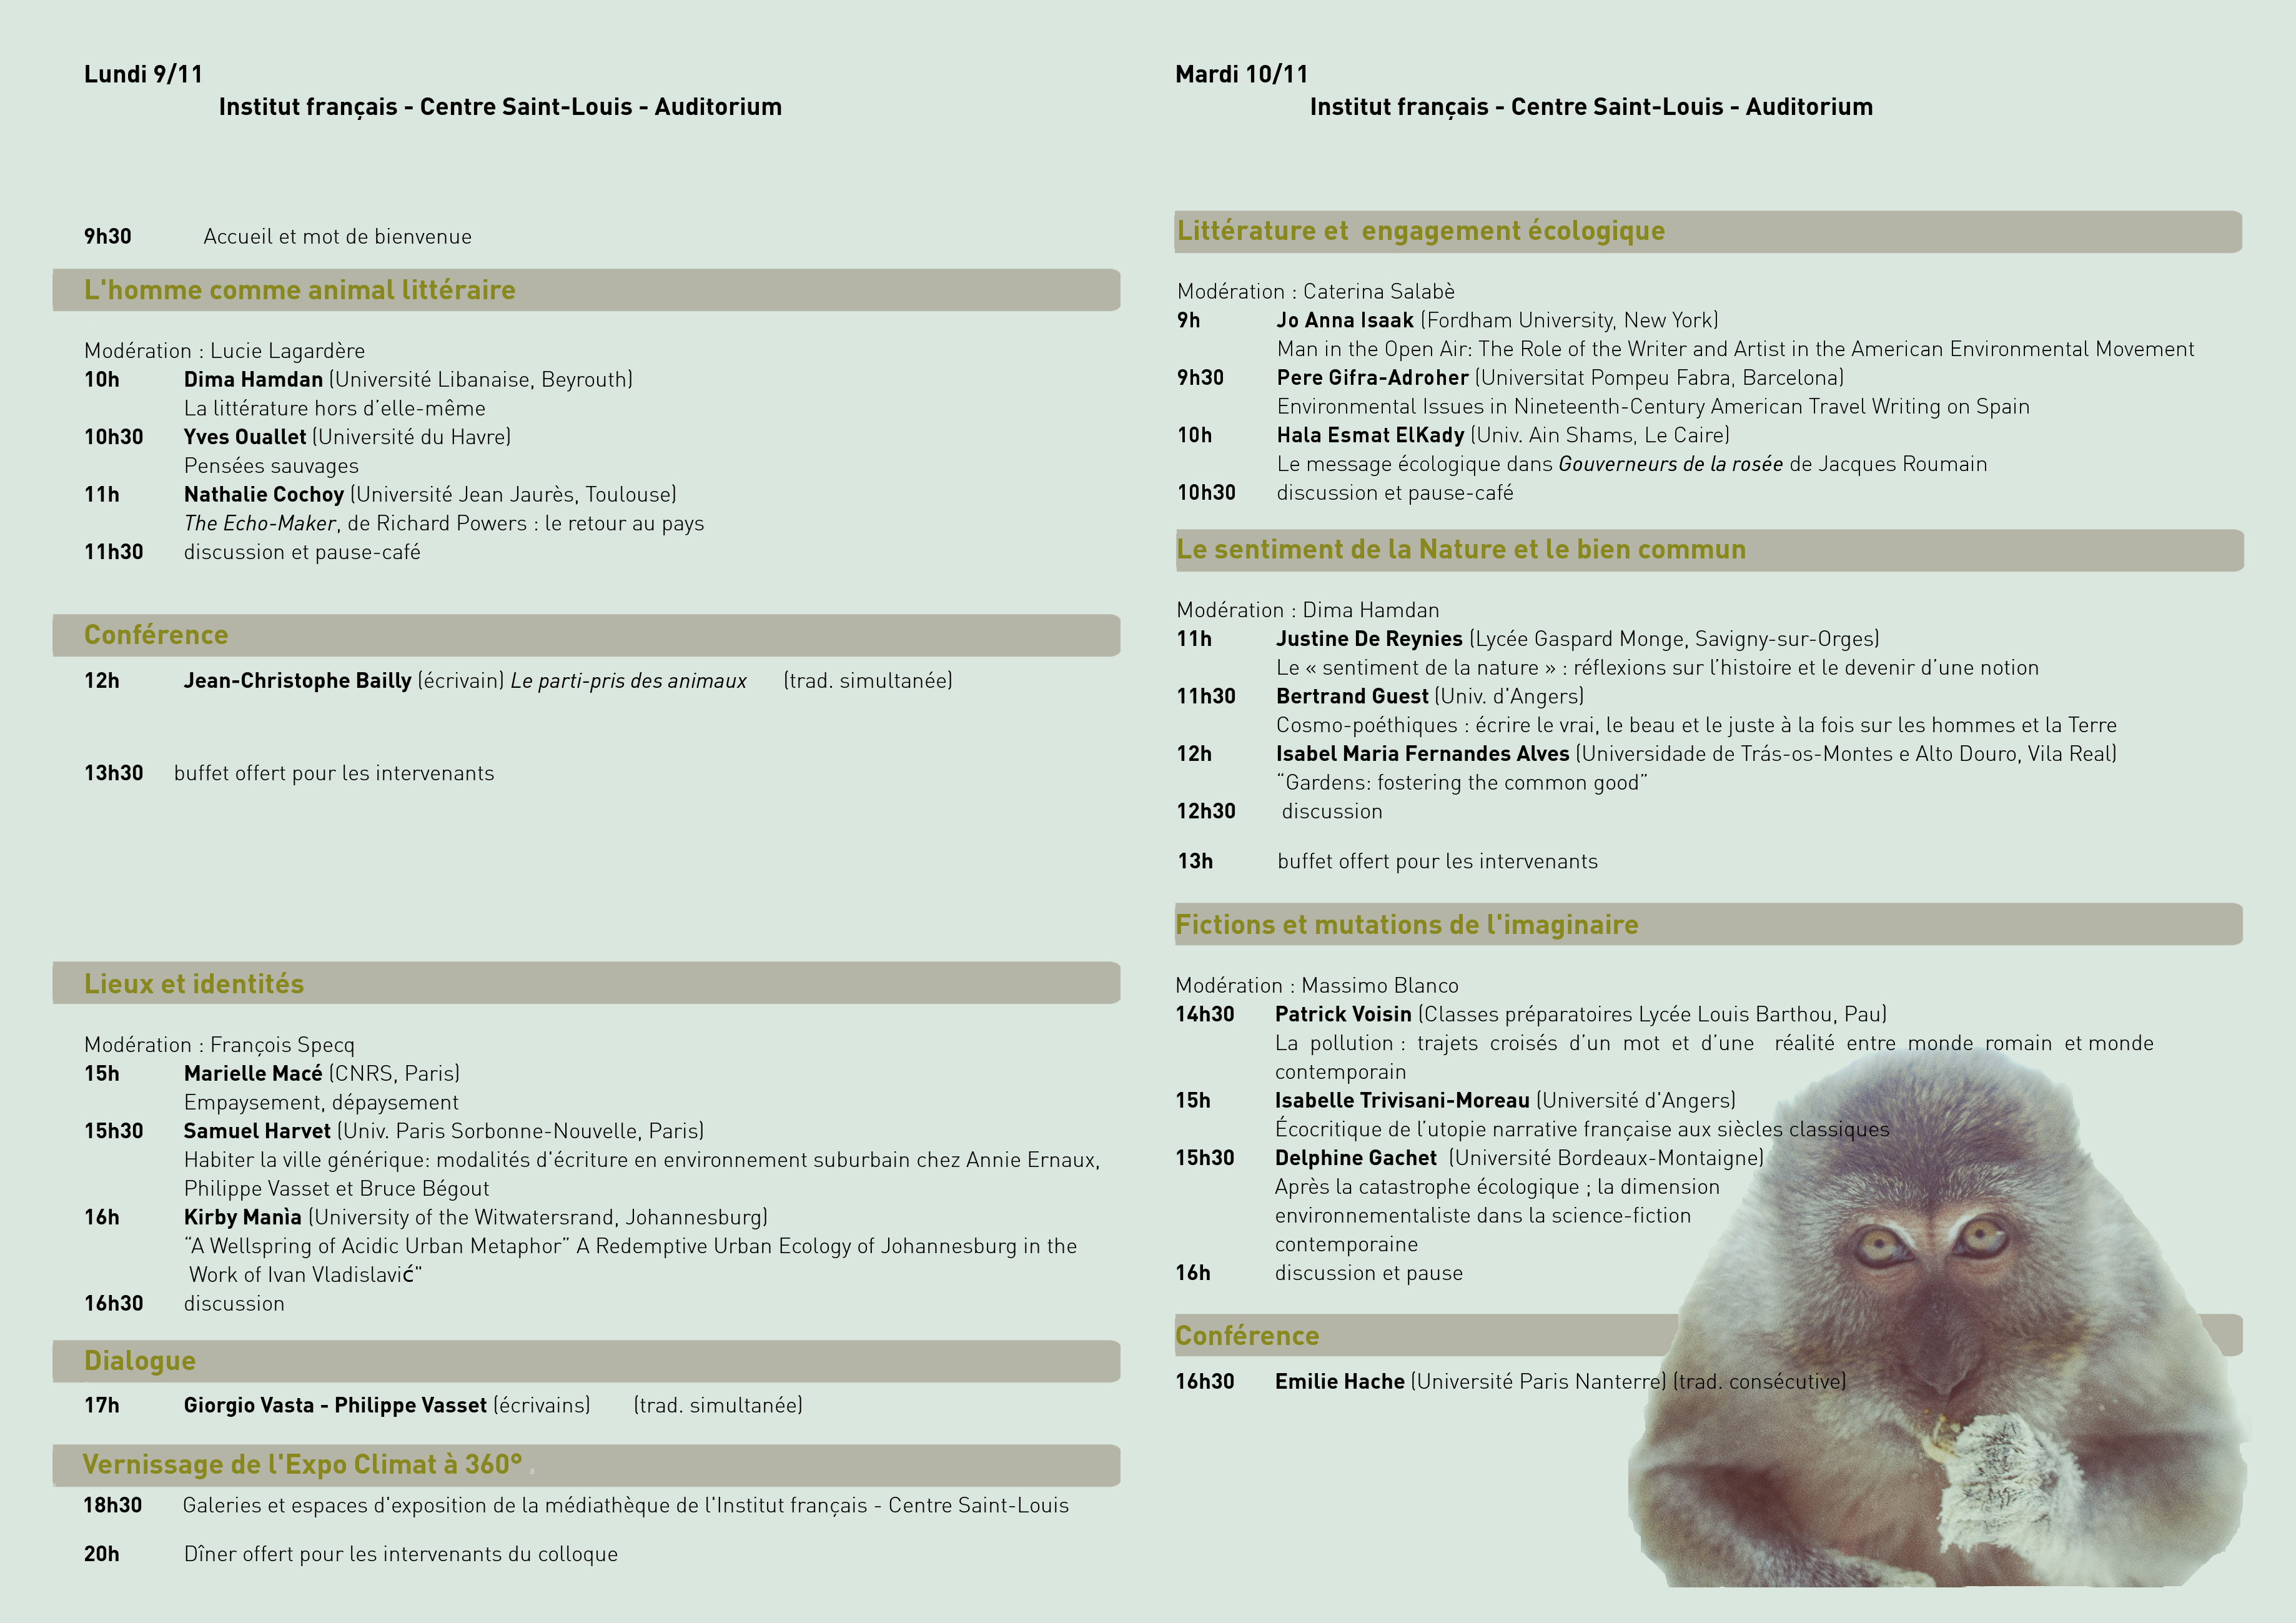 ALLEGATO 2 - Retro - Pgm - intérieur - impression+Expo